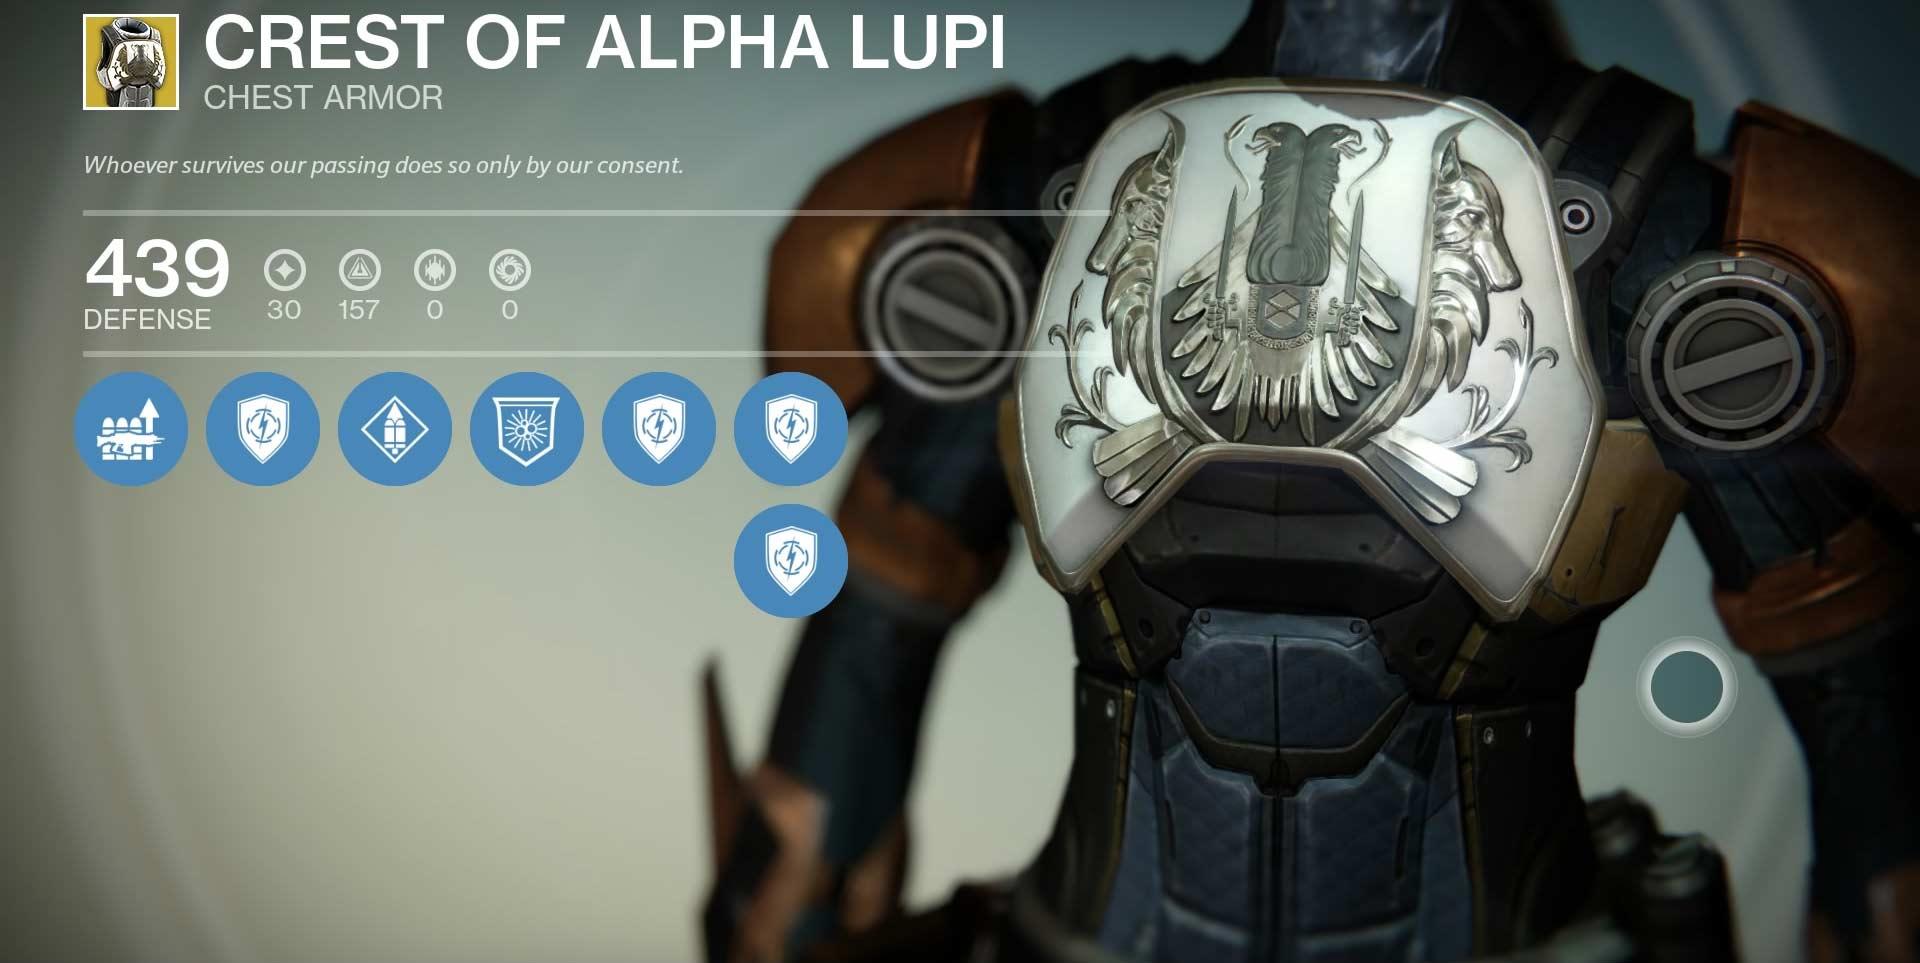 Crest of Alpha Lupi